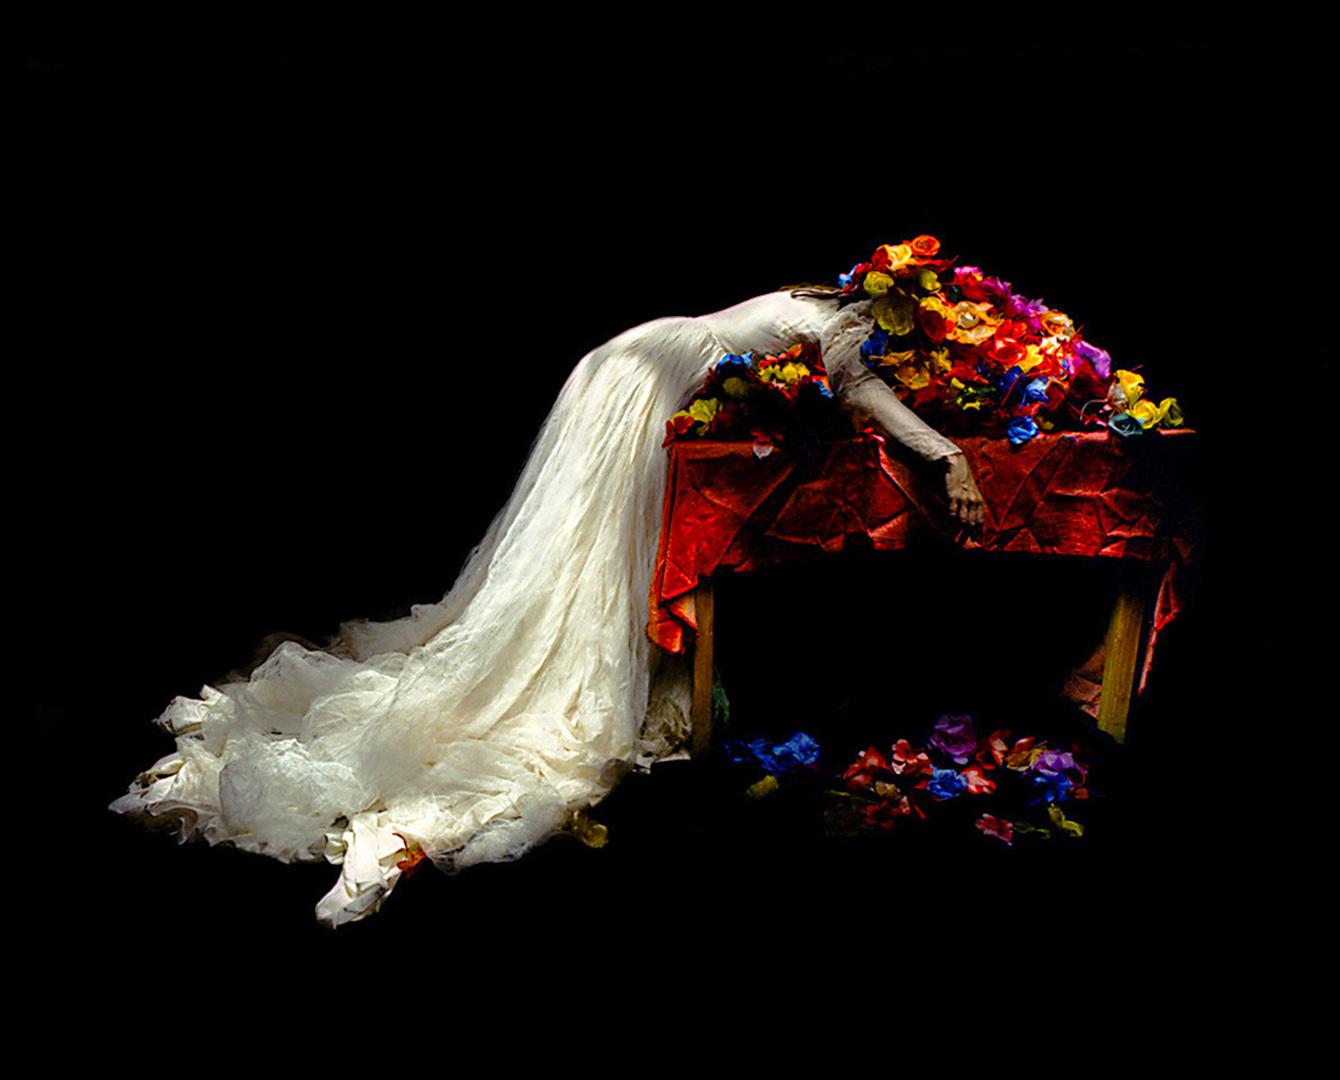 La novia muerta / The dead bride.